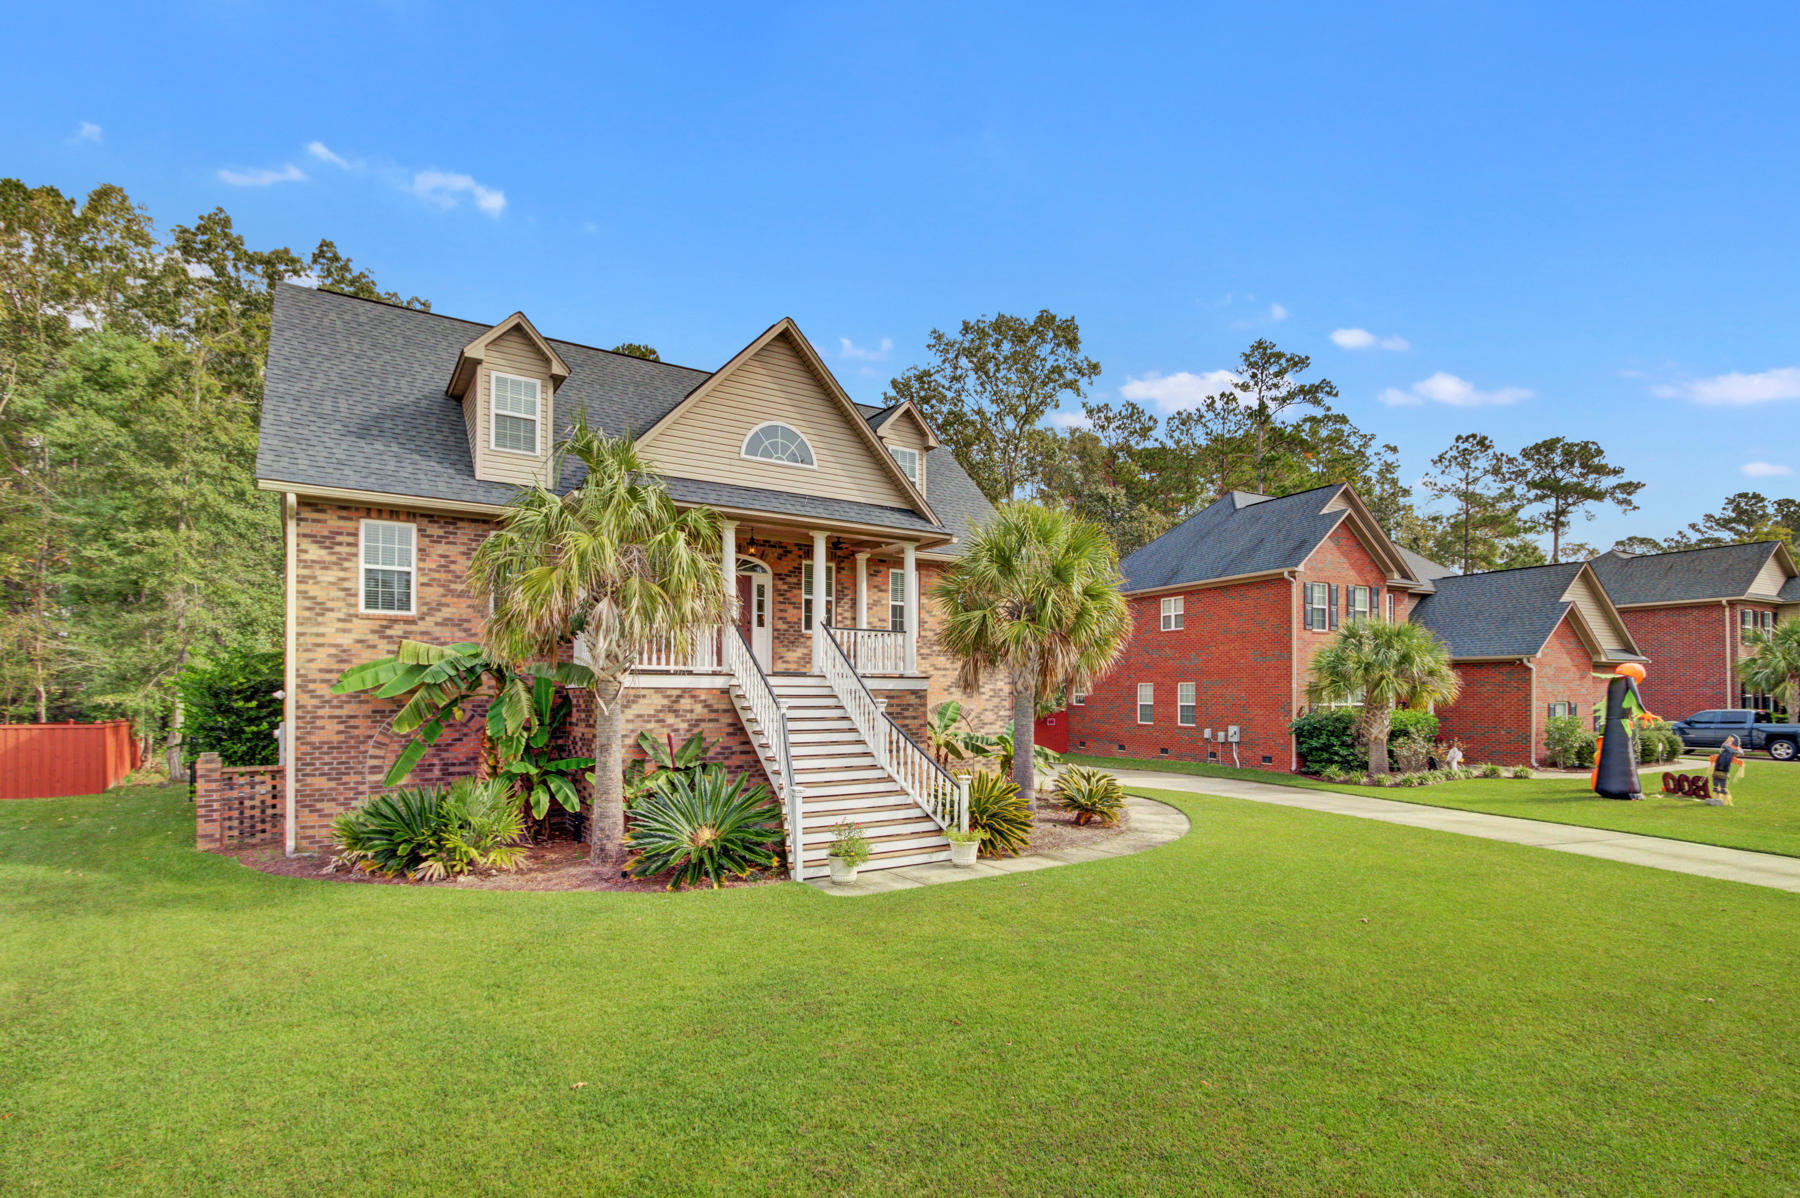 Cedar Grove Homes For Sale - 8733 Millerville, North Charleston, SC - 2